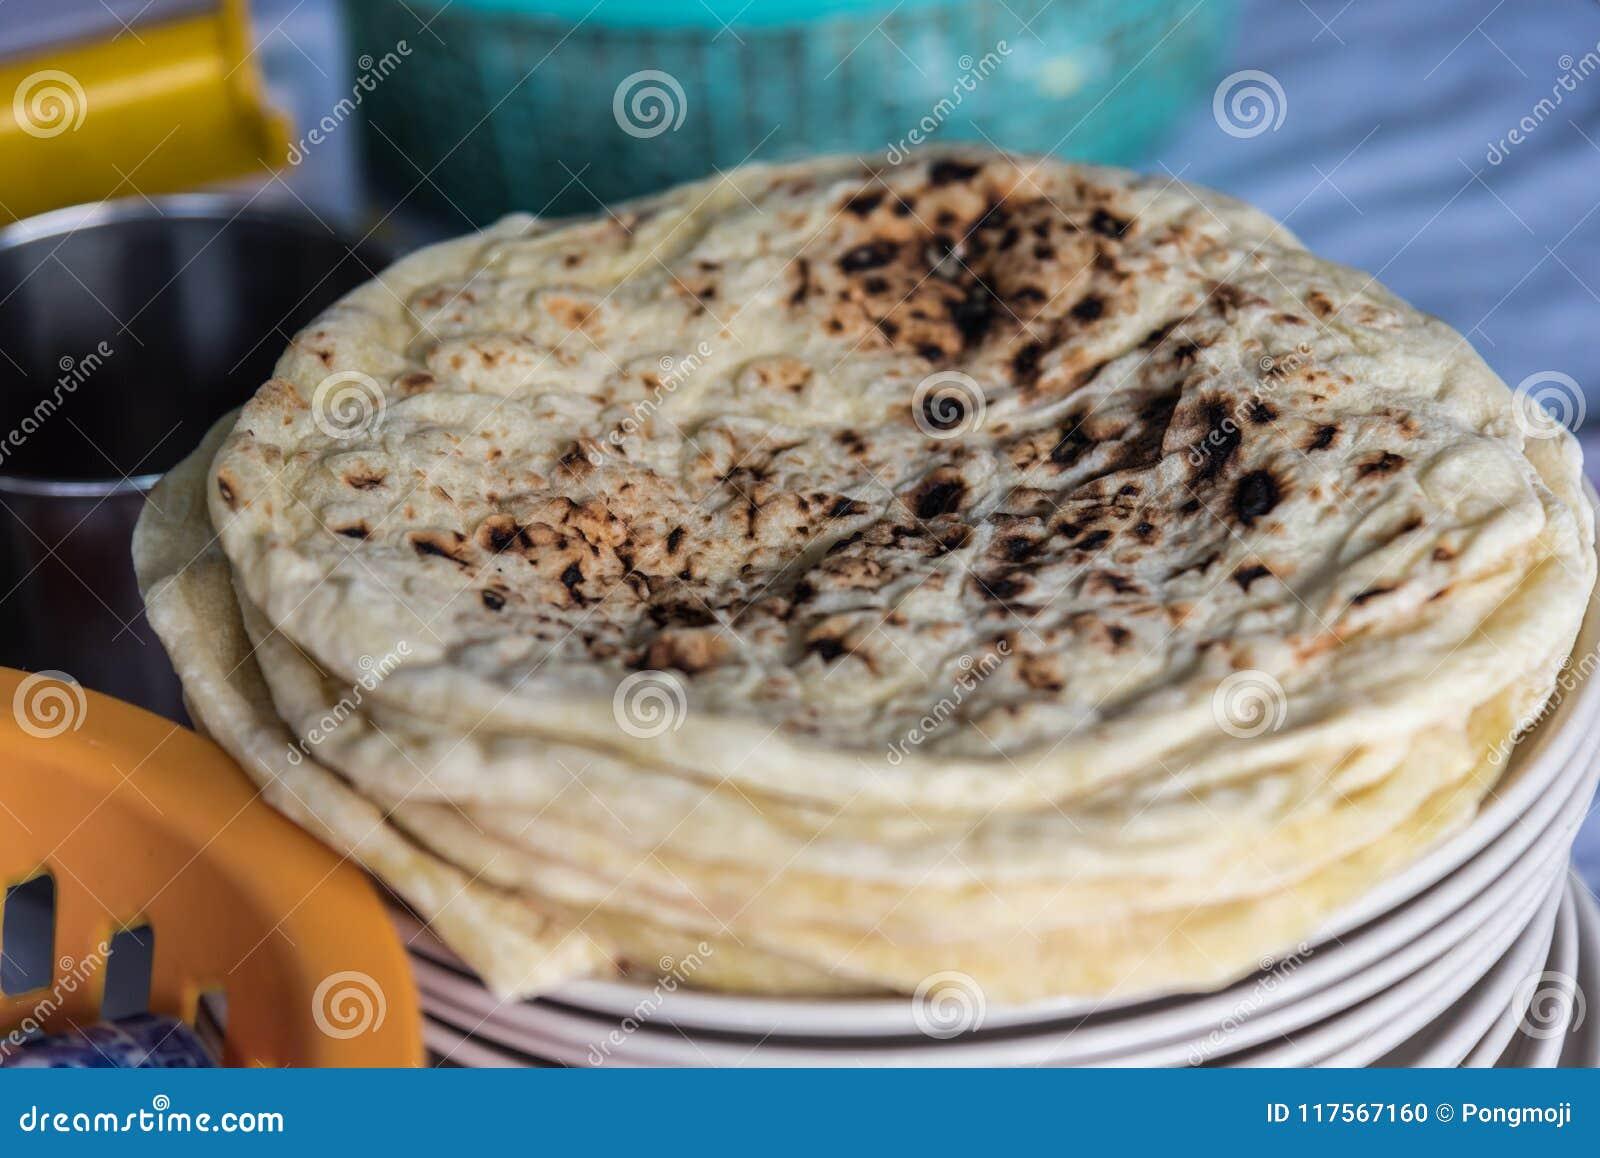 Roti, Chapatti, γιαγιά ή Naan στην αγορά τροφίμων οδών